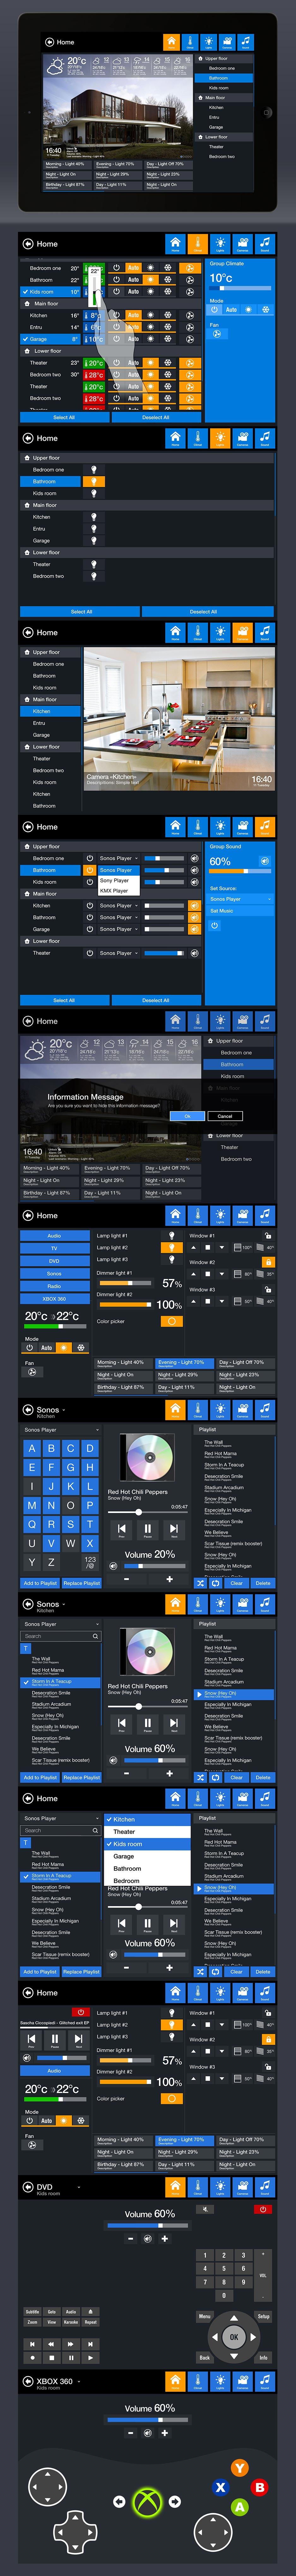 Умный дом Iridium | iPad